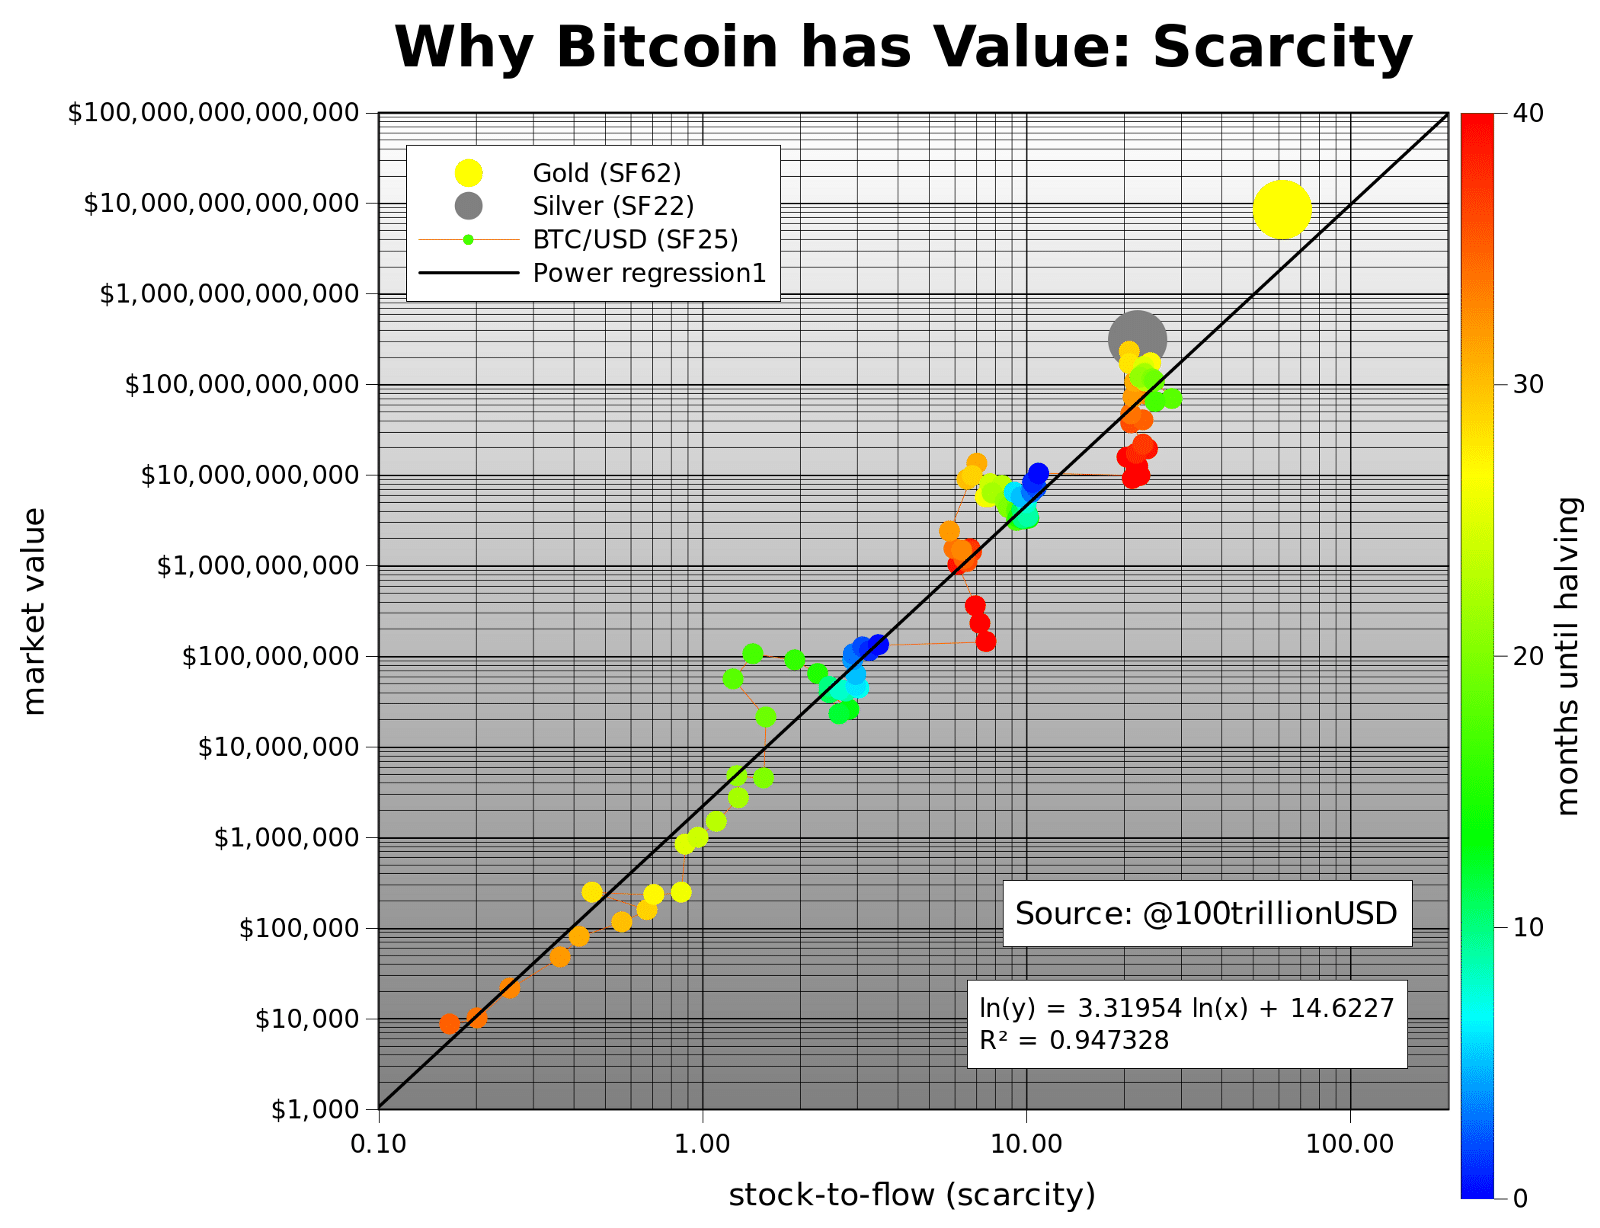 Top 5 Bitcoin price prediction charts for Bitcoin halving 2020